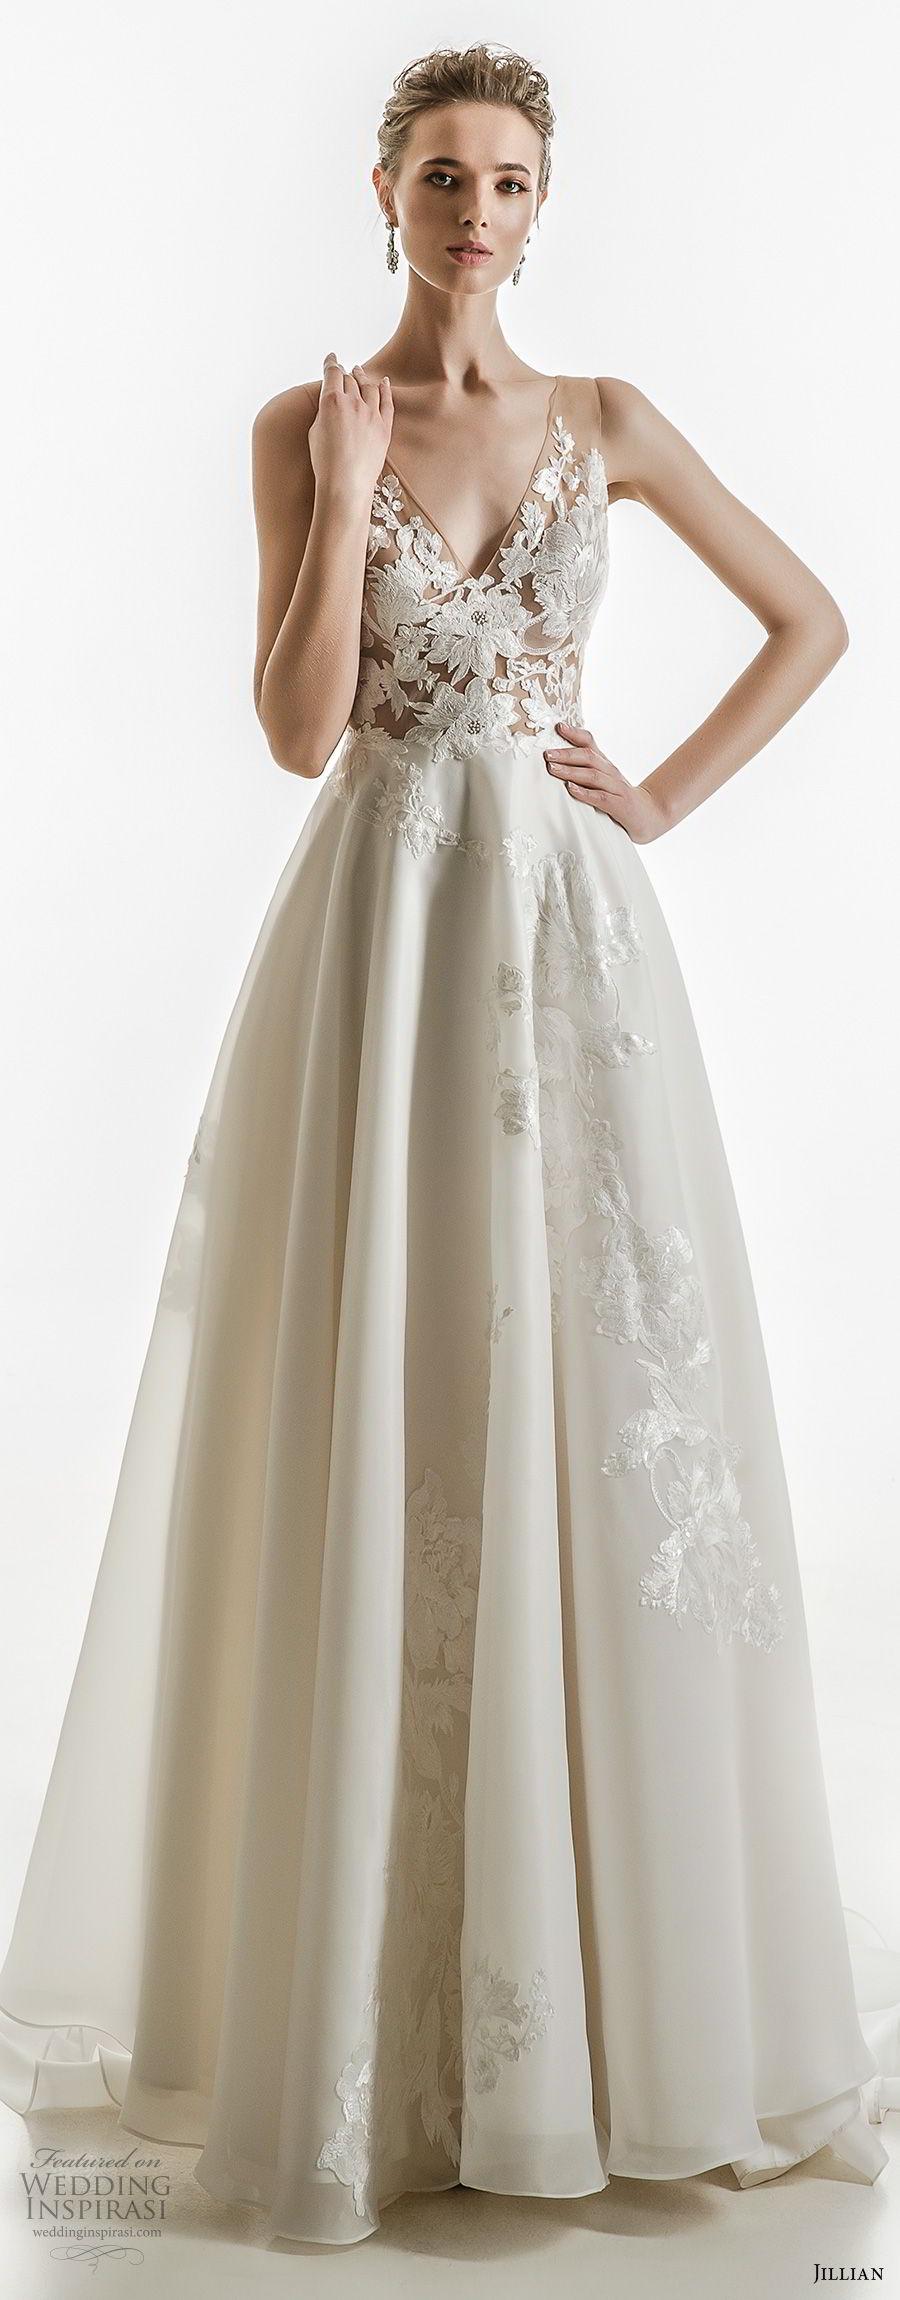 jillian 2018 bridal sleeveless v neck heavily embellished bodice elegant a  line wedding dress open v back medium train (14) mv